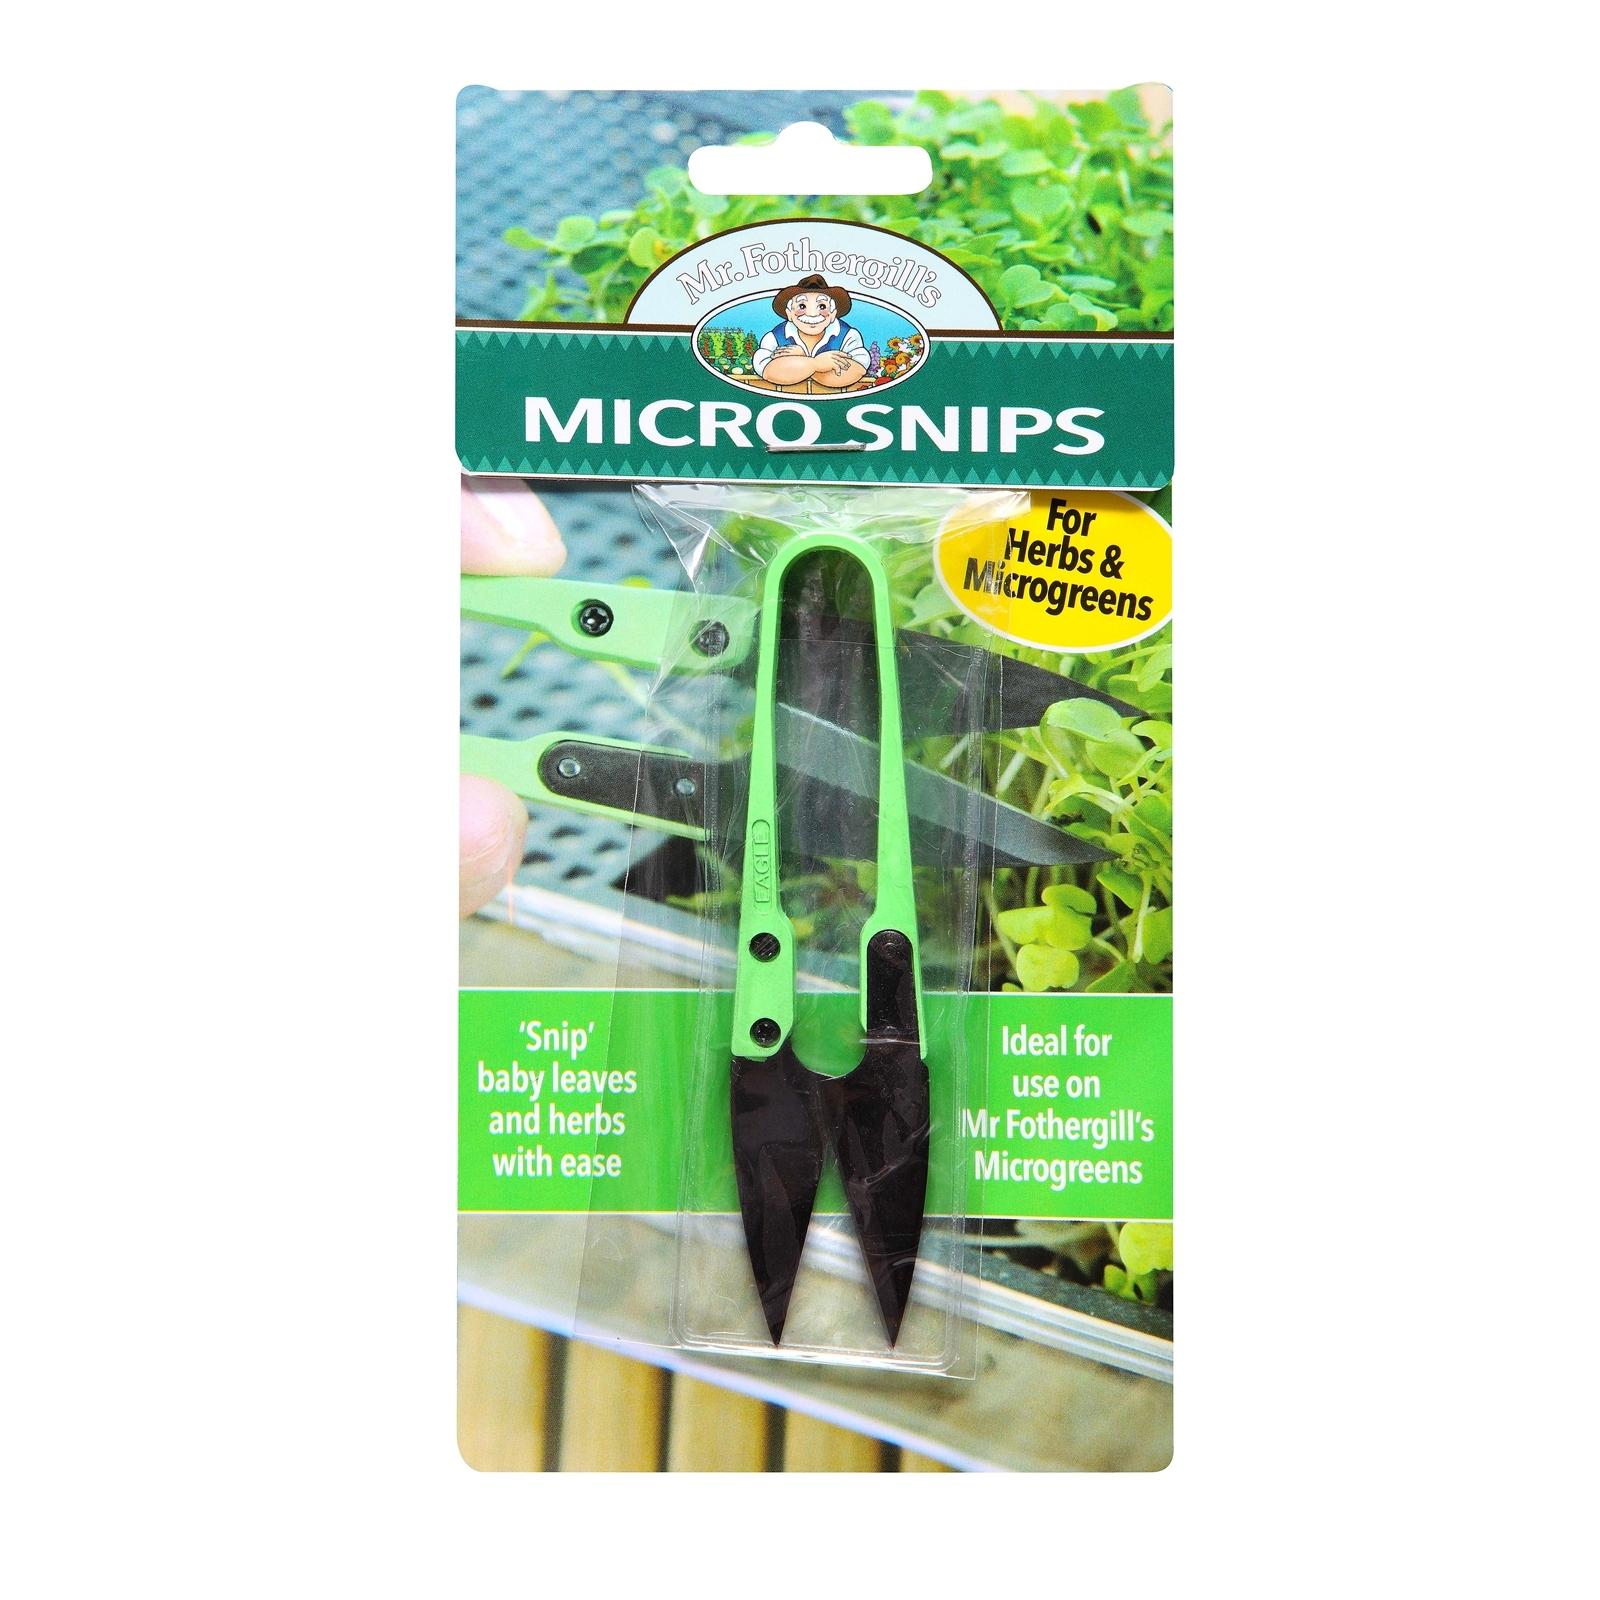 Mr Fothergill's Micro Snips